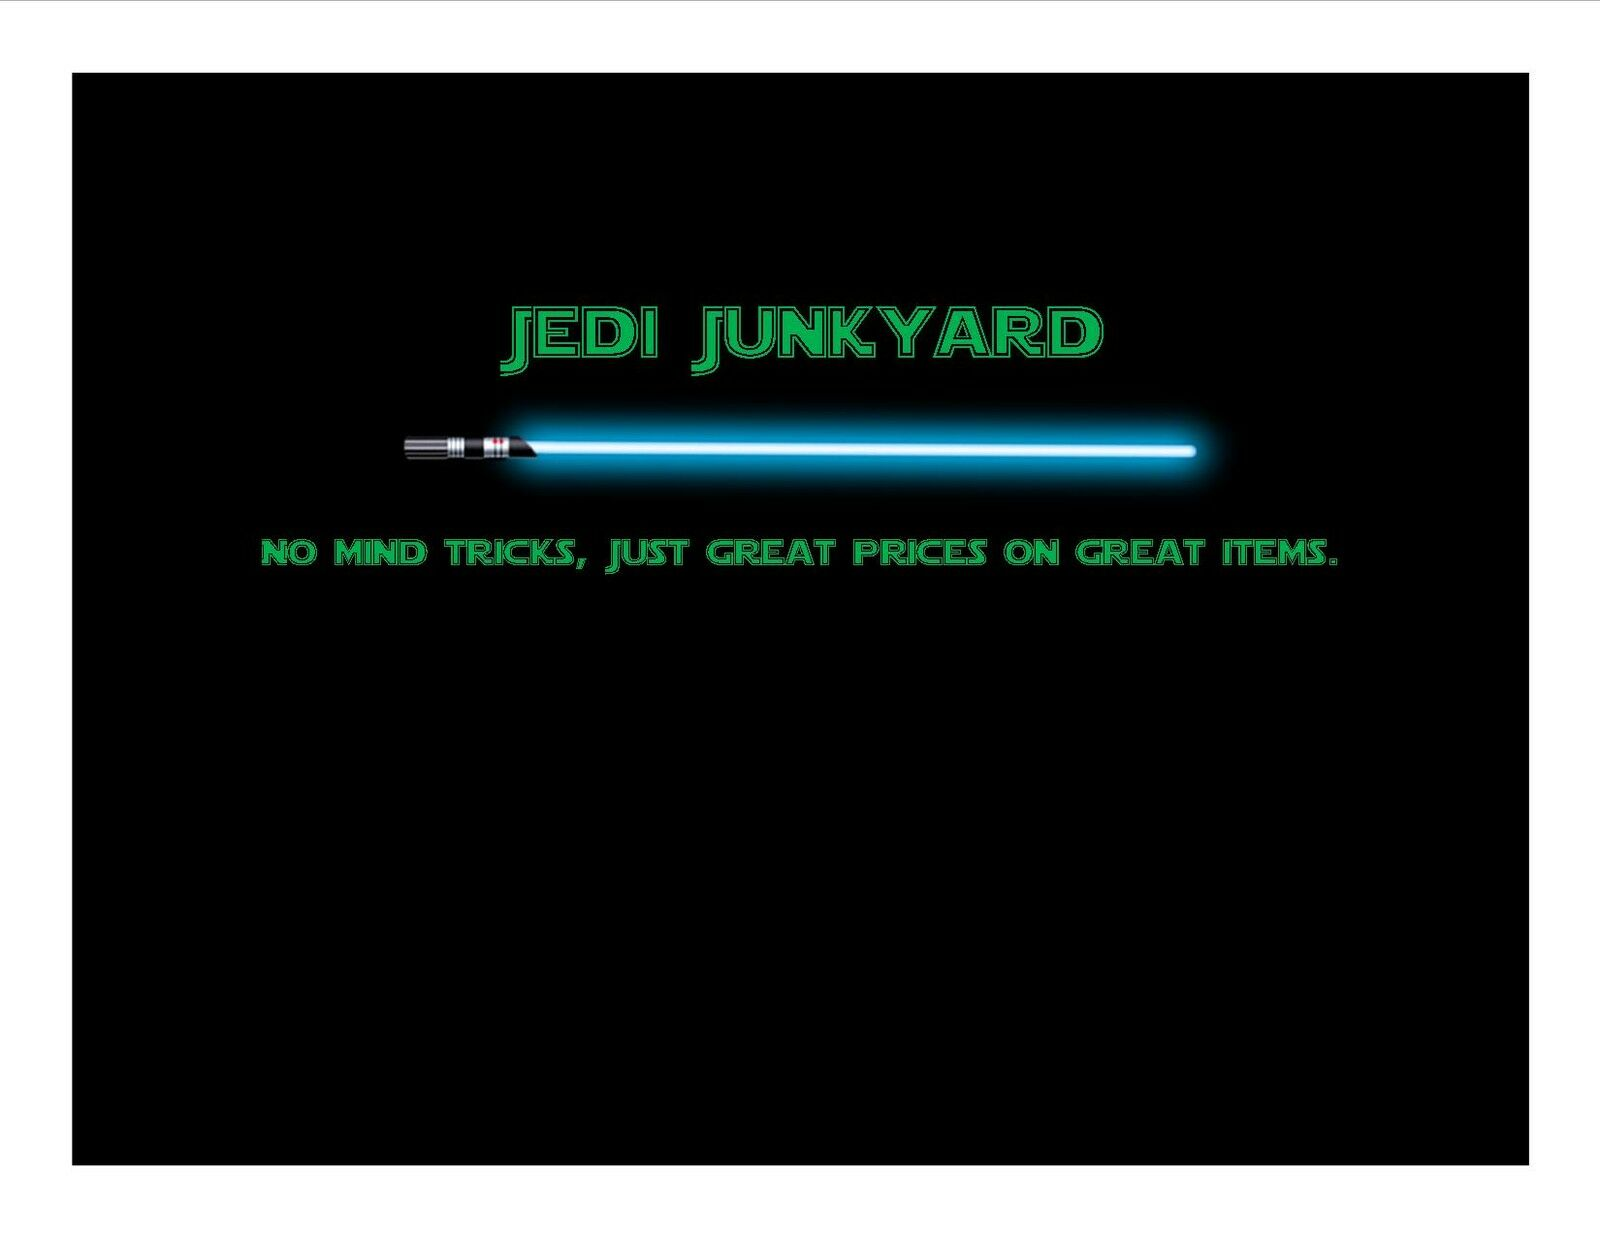 Jedi Junkyard